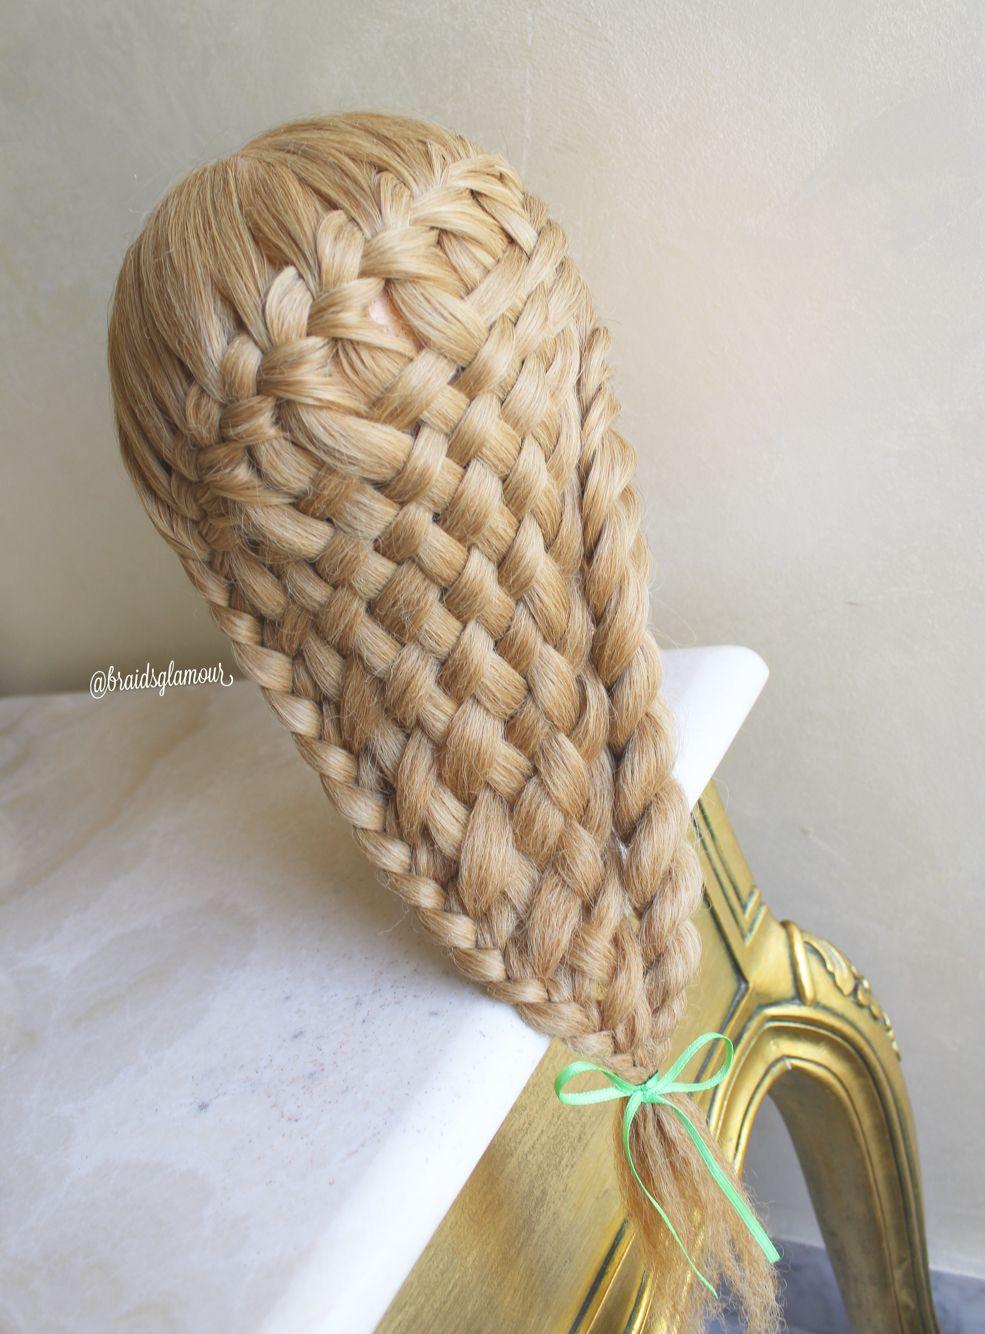 Waterfall Woven Braid Combo Braided Hairstyles Hair Creations Pinterest Hair